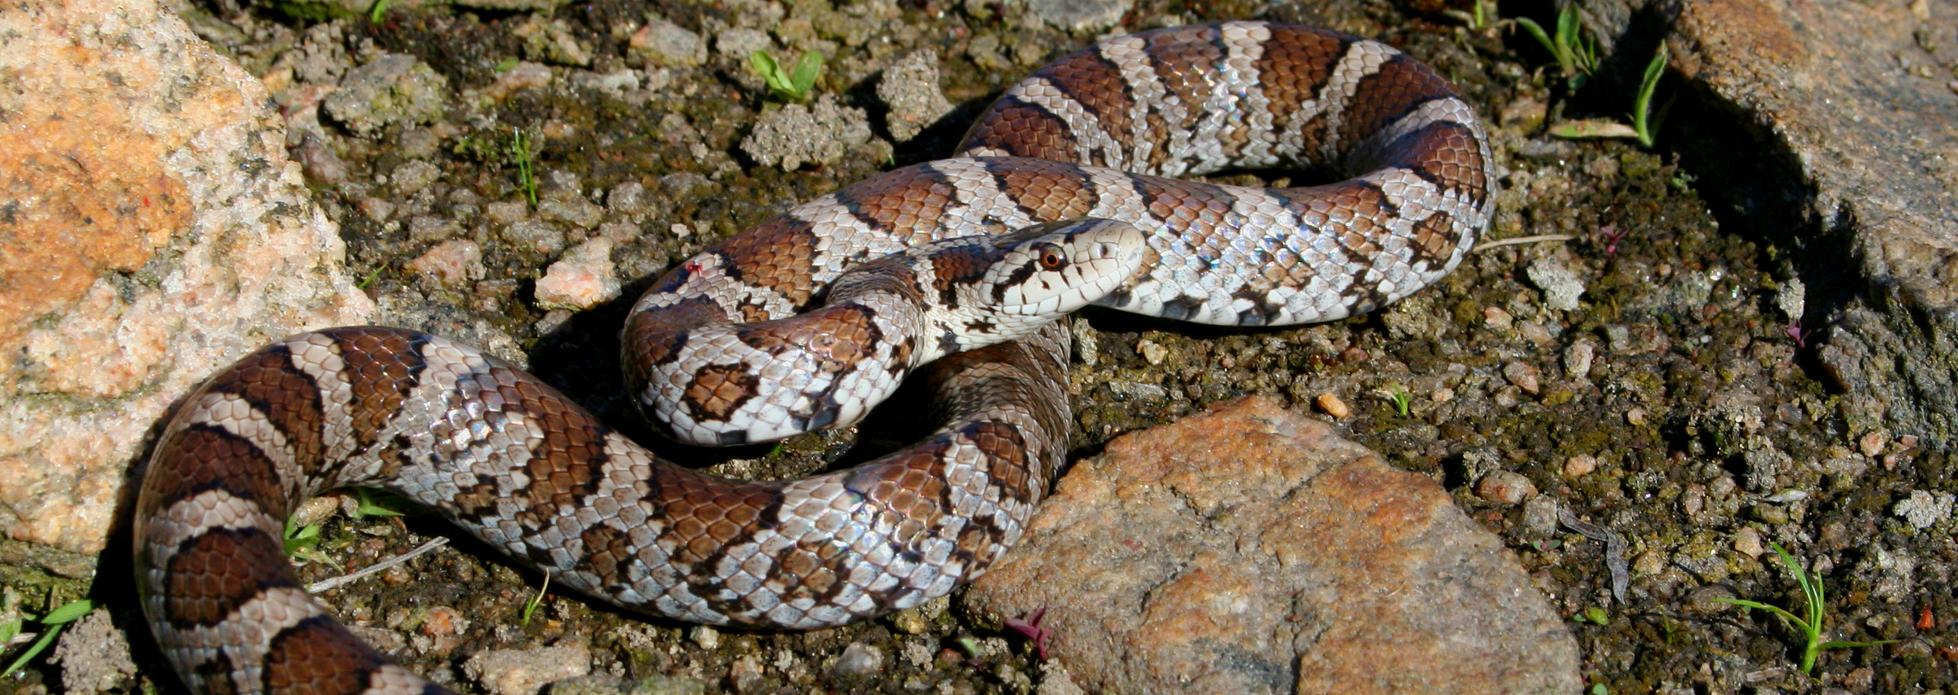 Milksnake | Reptiles and Amphibians in Ontario | Ontario Nature